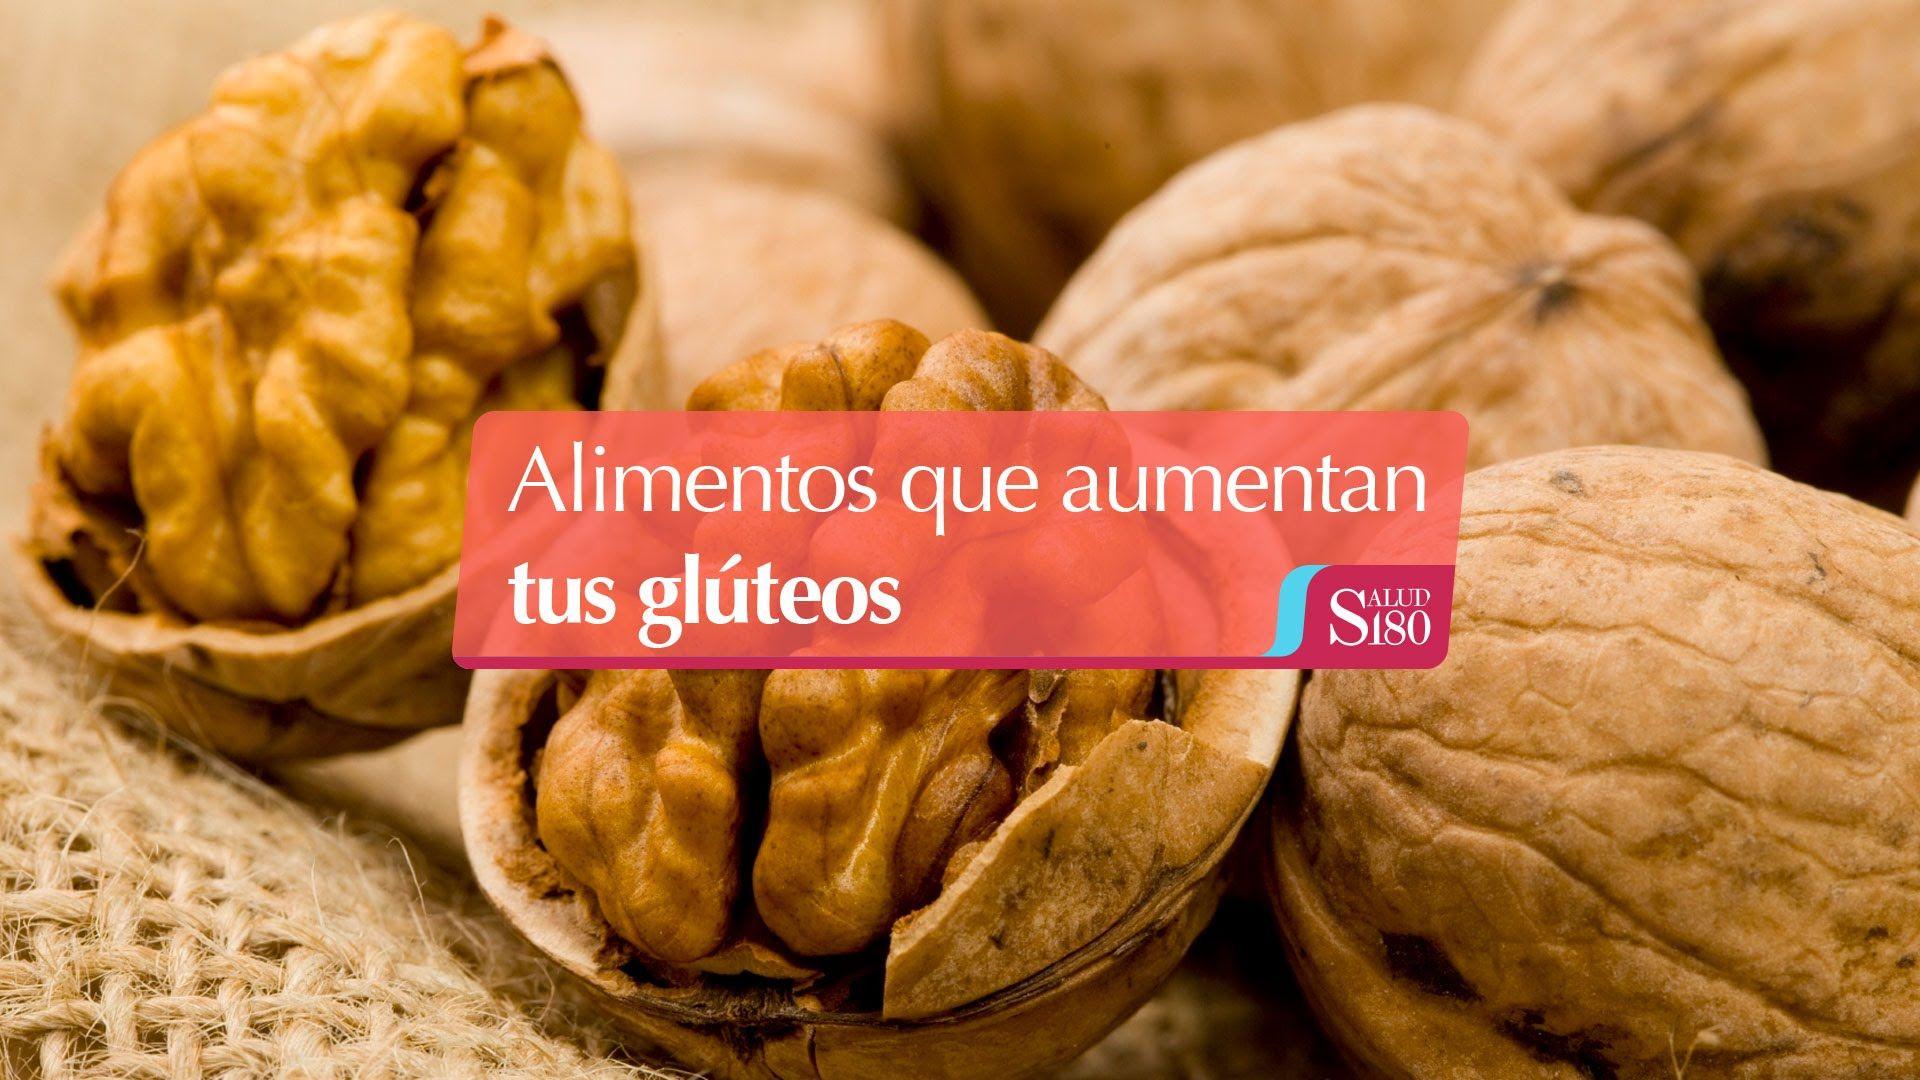 Aumenta tus glúteos sin engordar   Transfórmate   Salud180